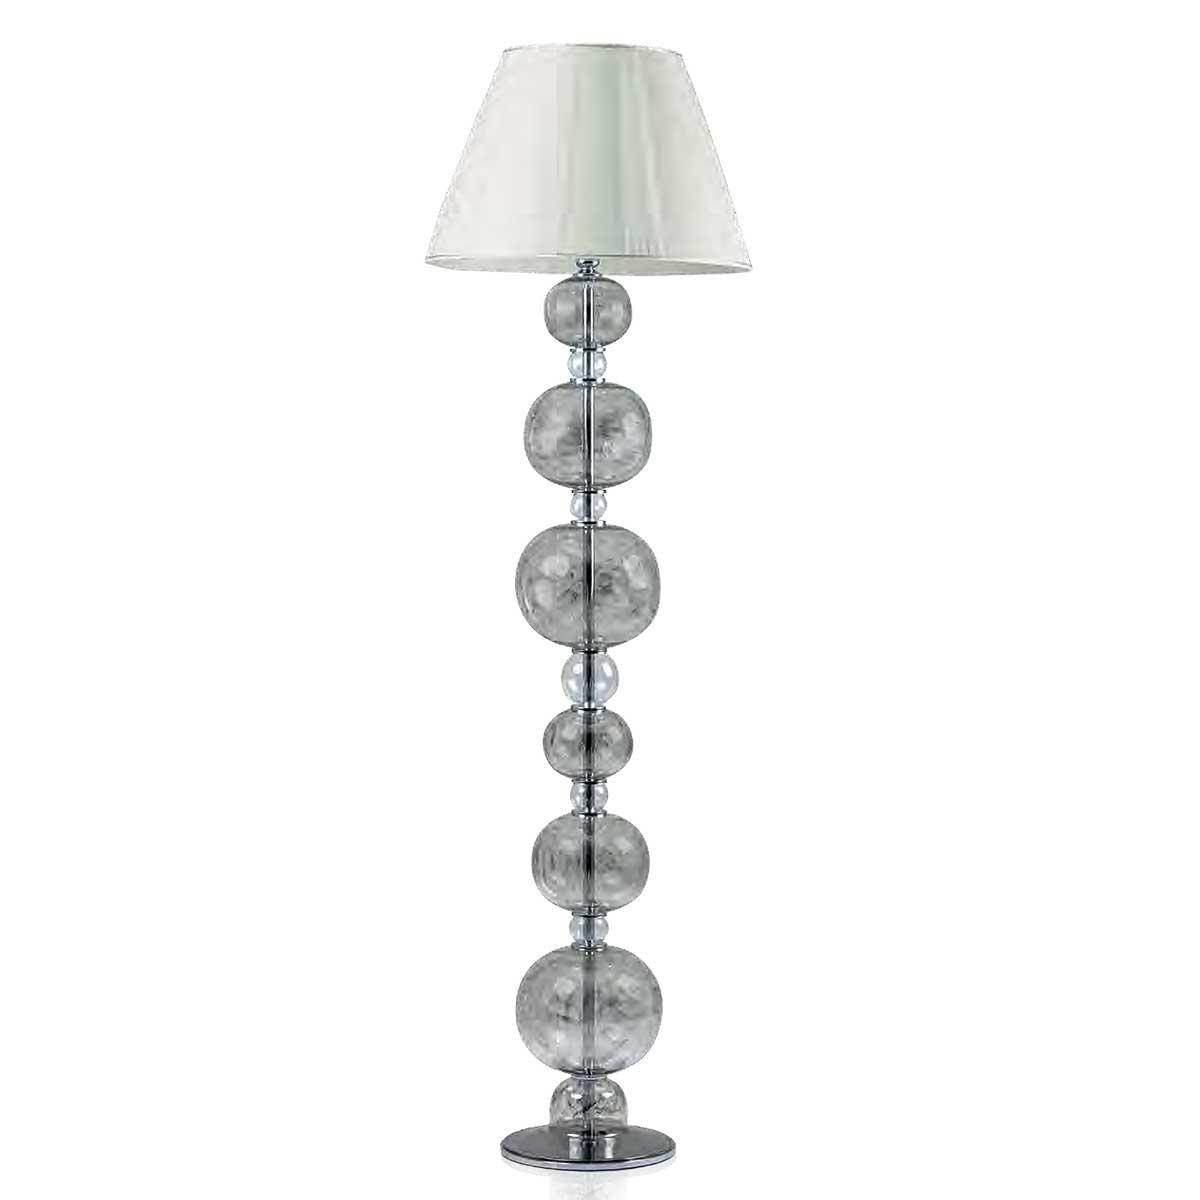 """Soffice"" lampara de pie de Murano - 1 luce - platinum mat"